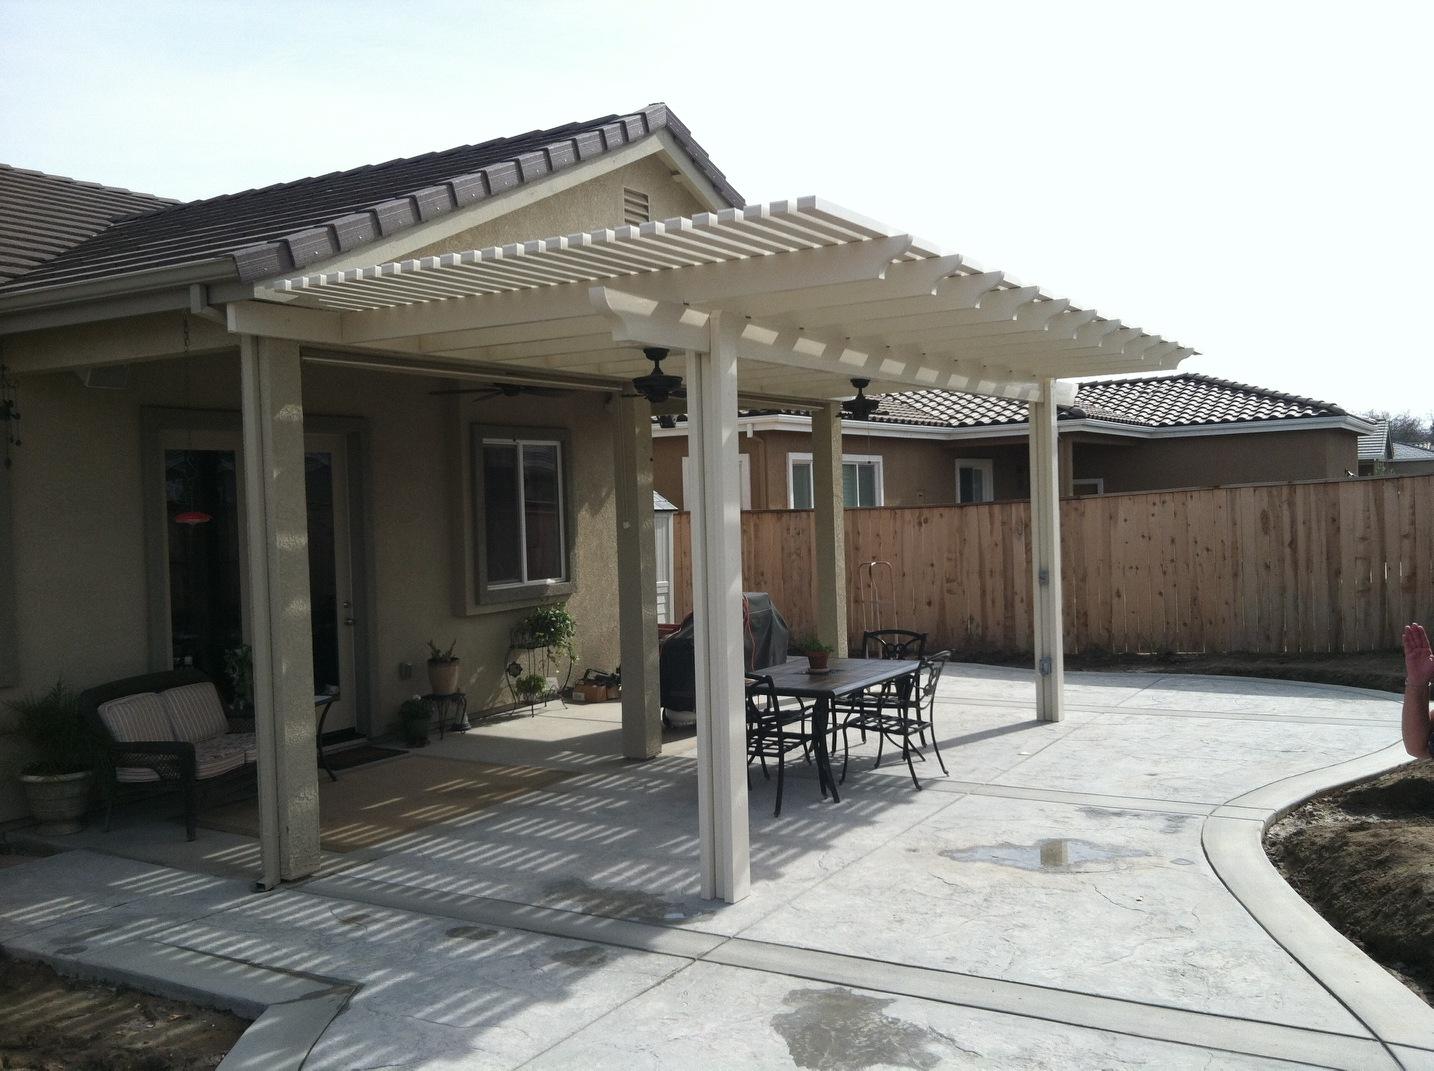 10 x 20 patio cover - patio ideas